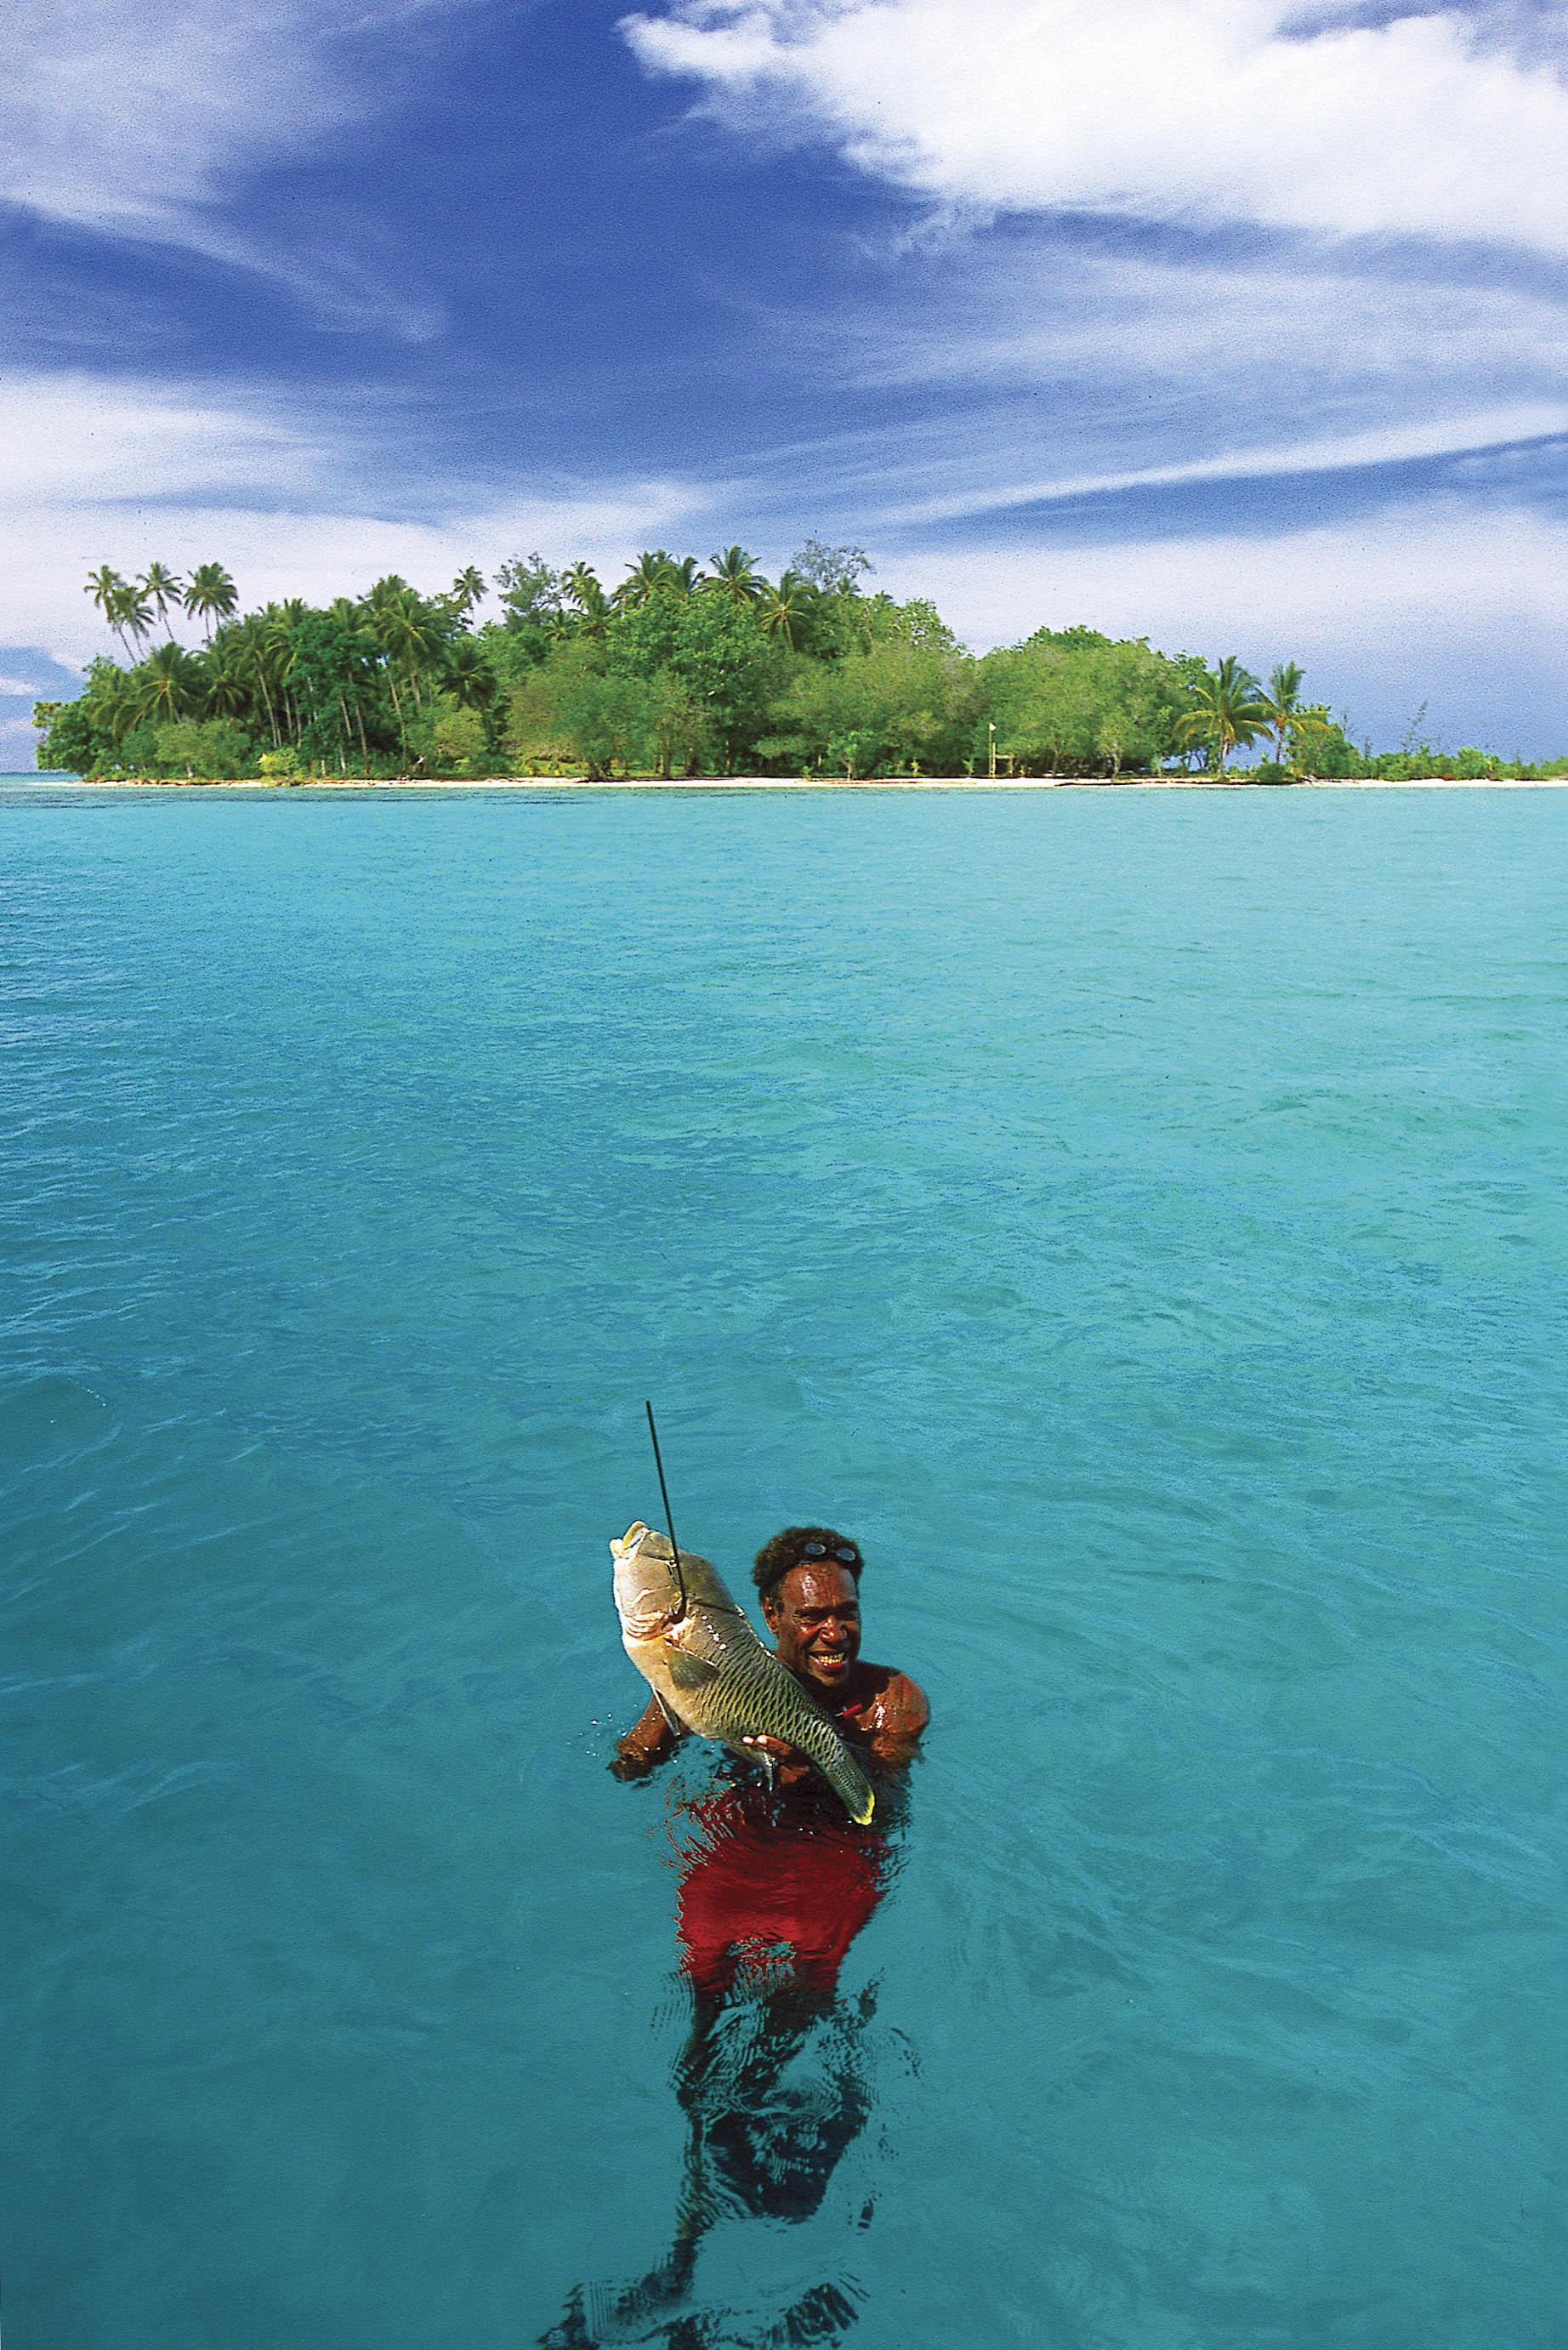 Fishing in the Solomon Islands (image care of Solomon Islands Visitors Bureau).